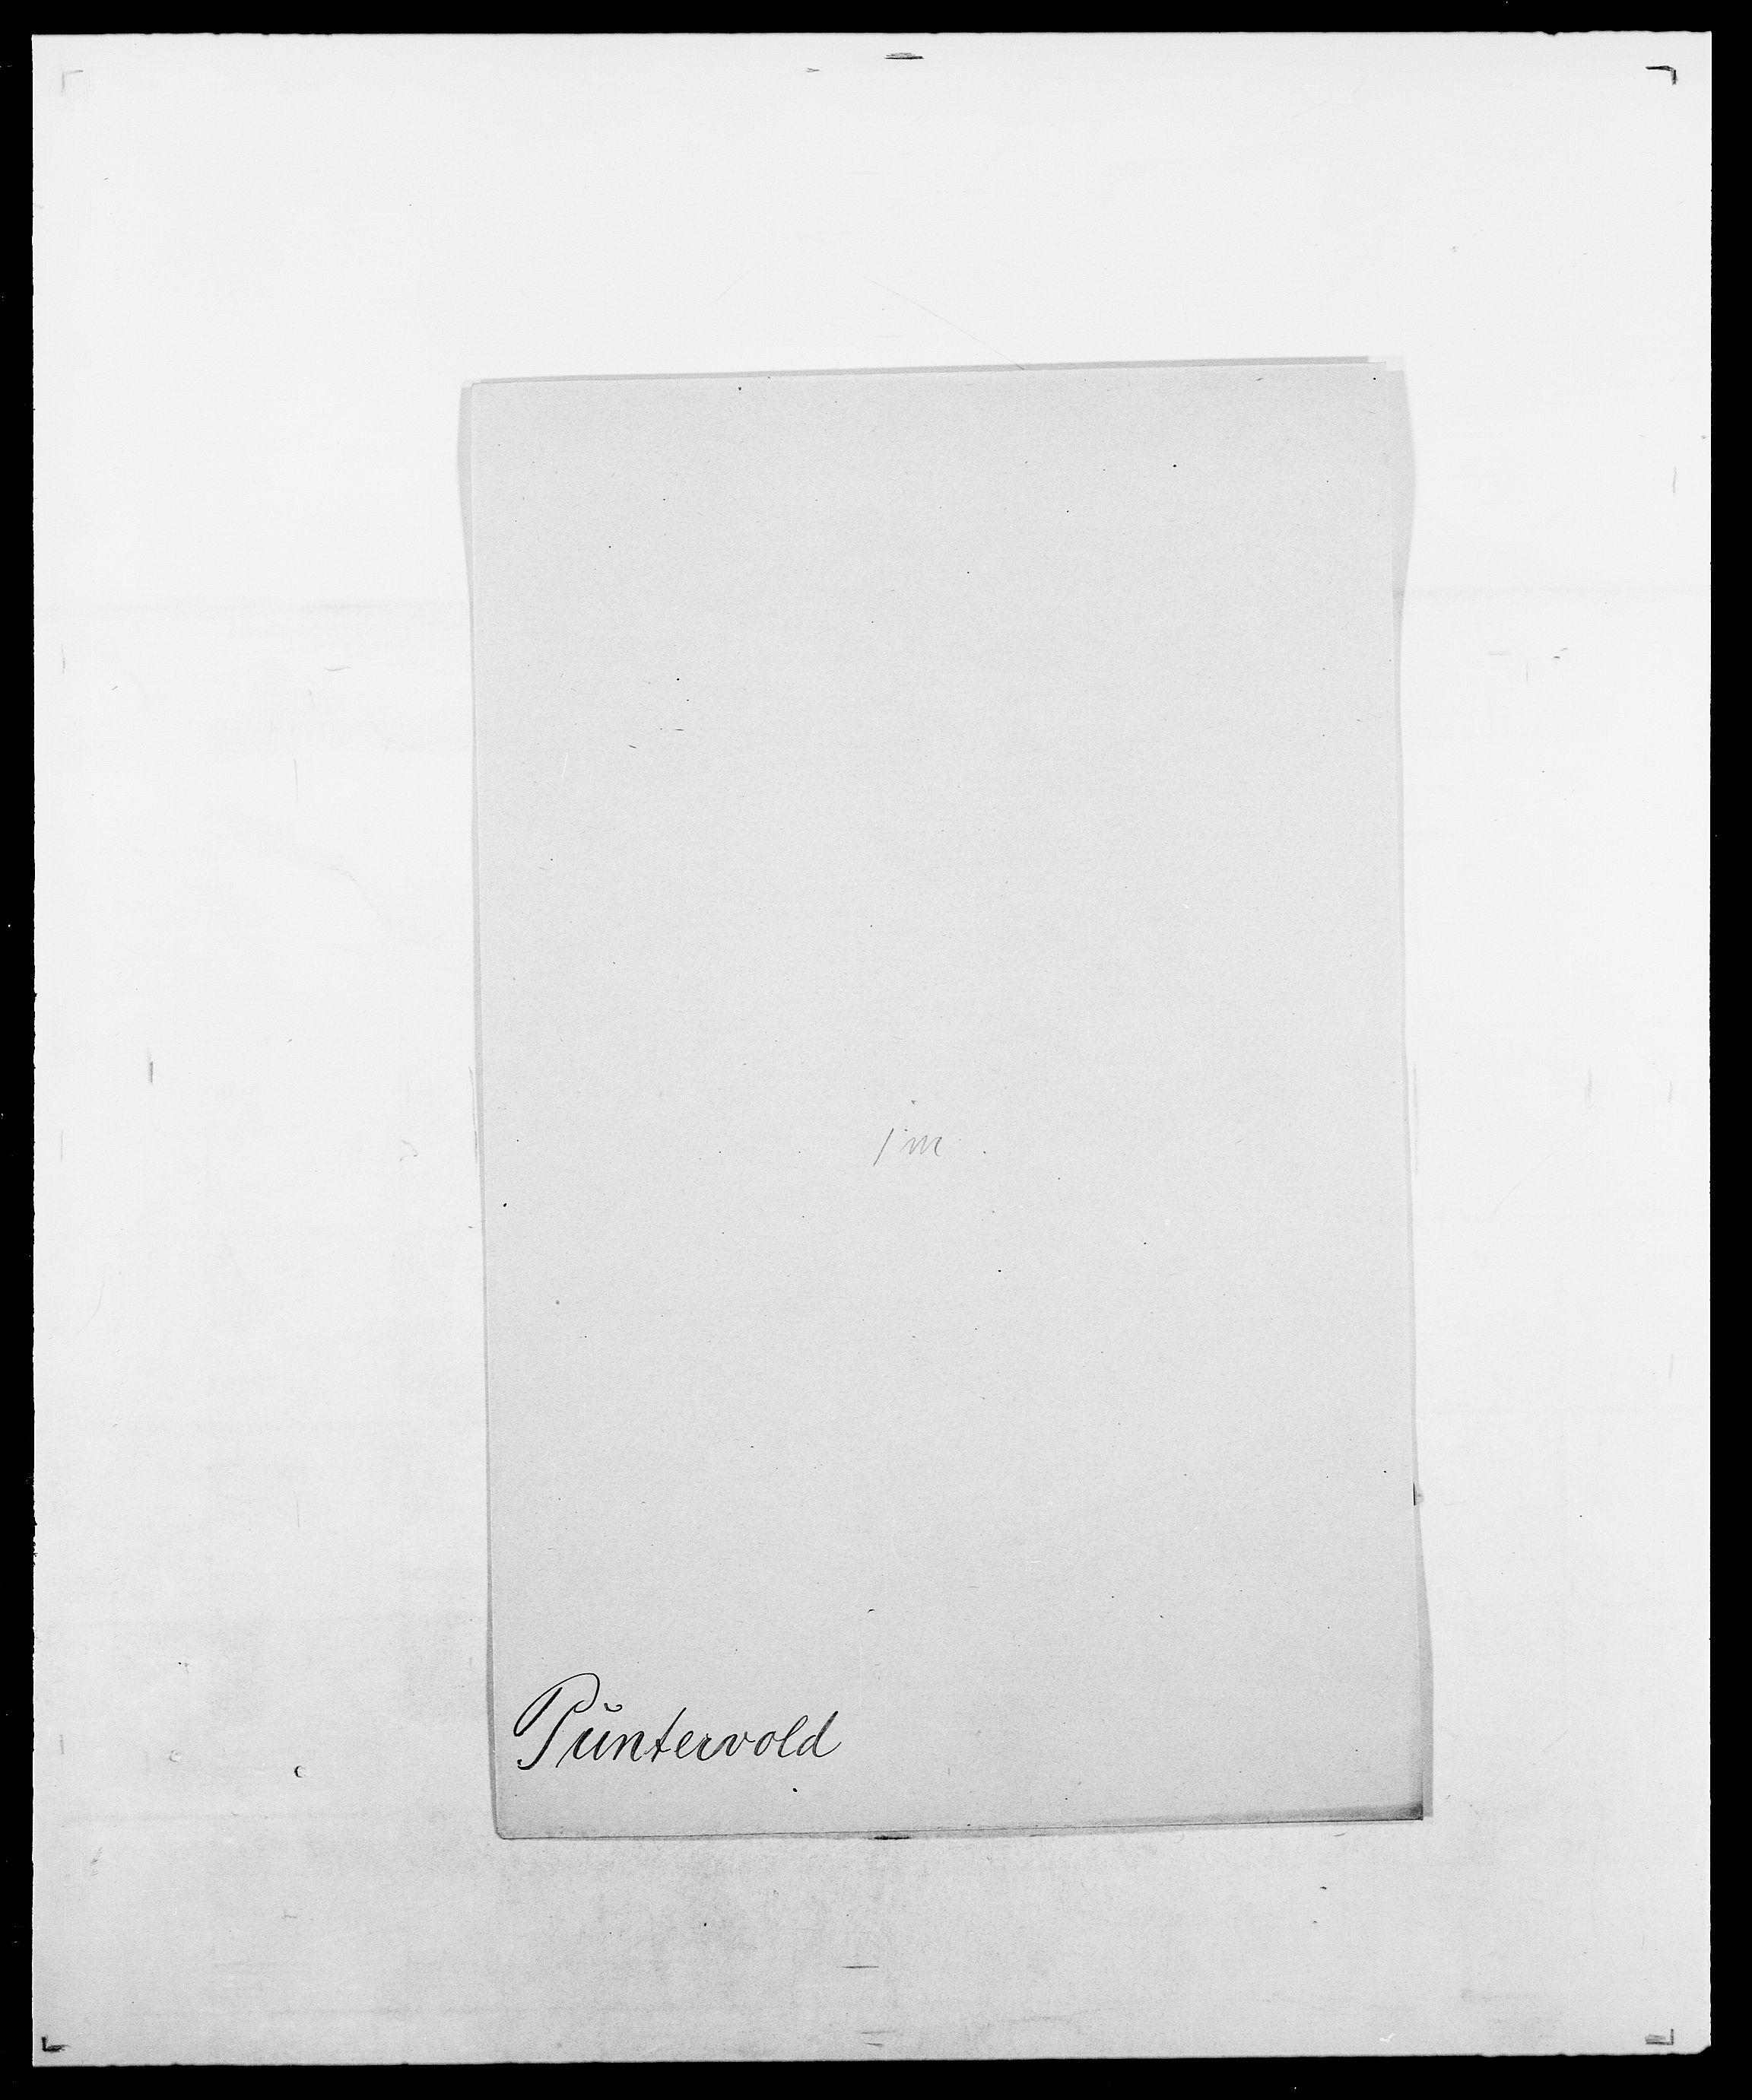 SAO, Delgobe, Charles Antoine - samling, D/Da/L0031: de Place - Raaum, s. 444